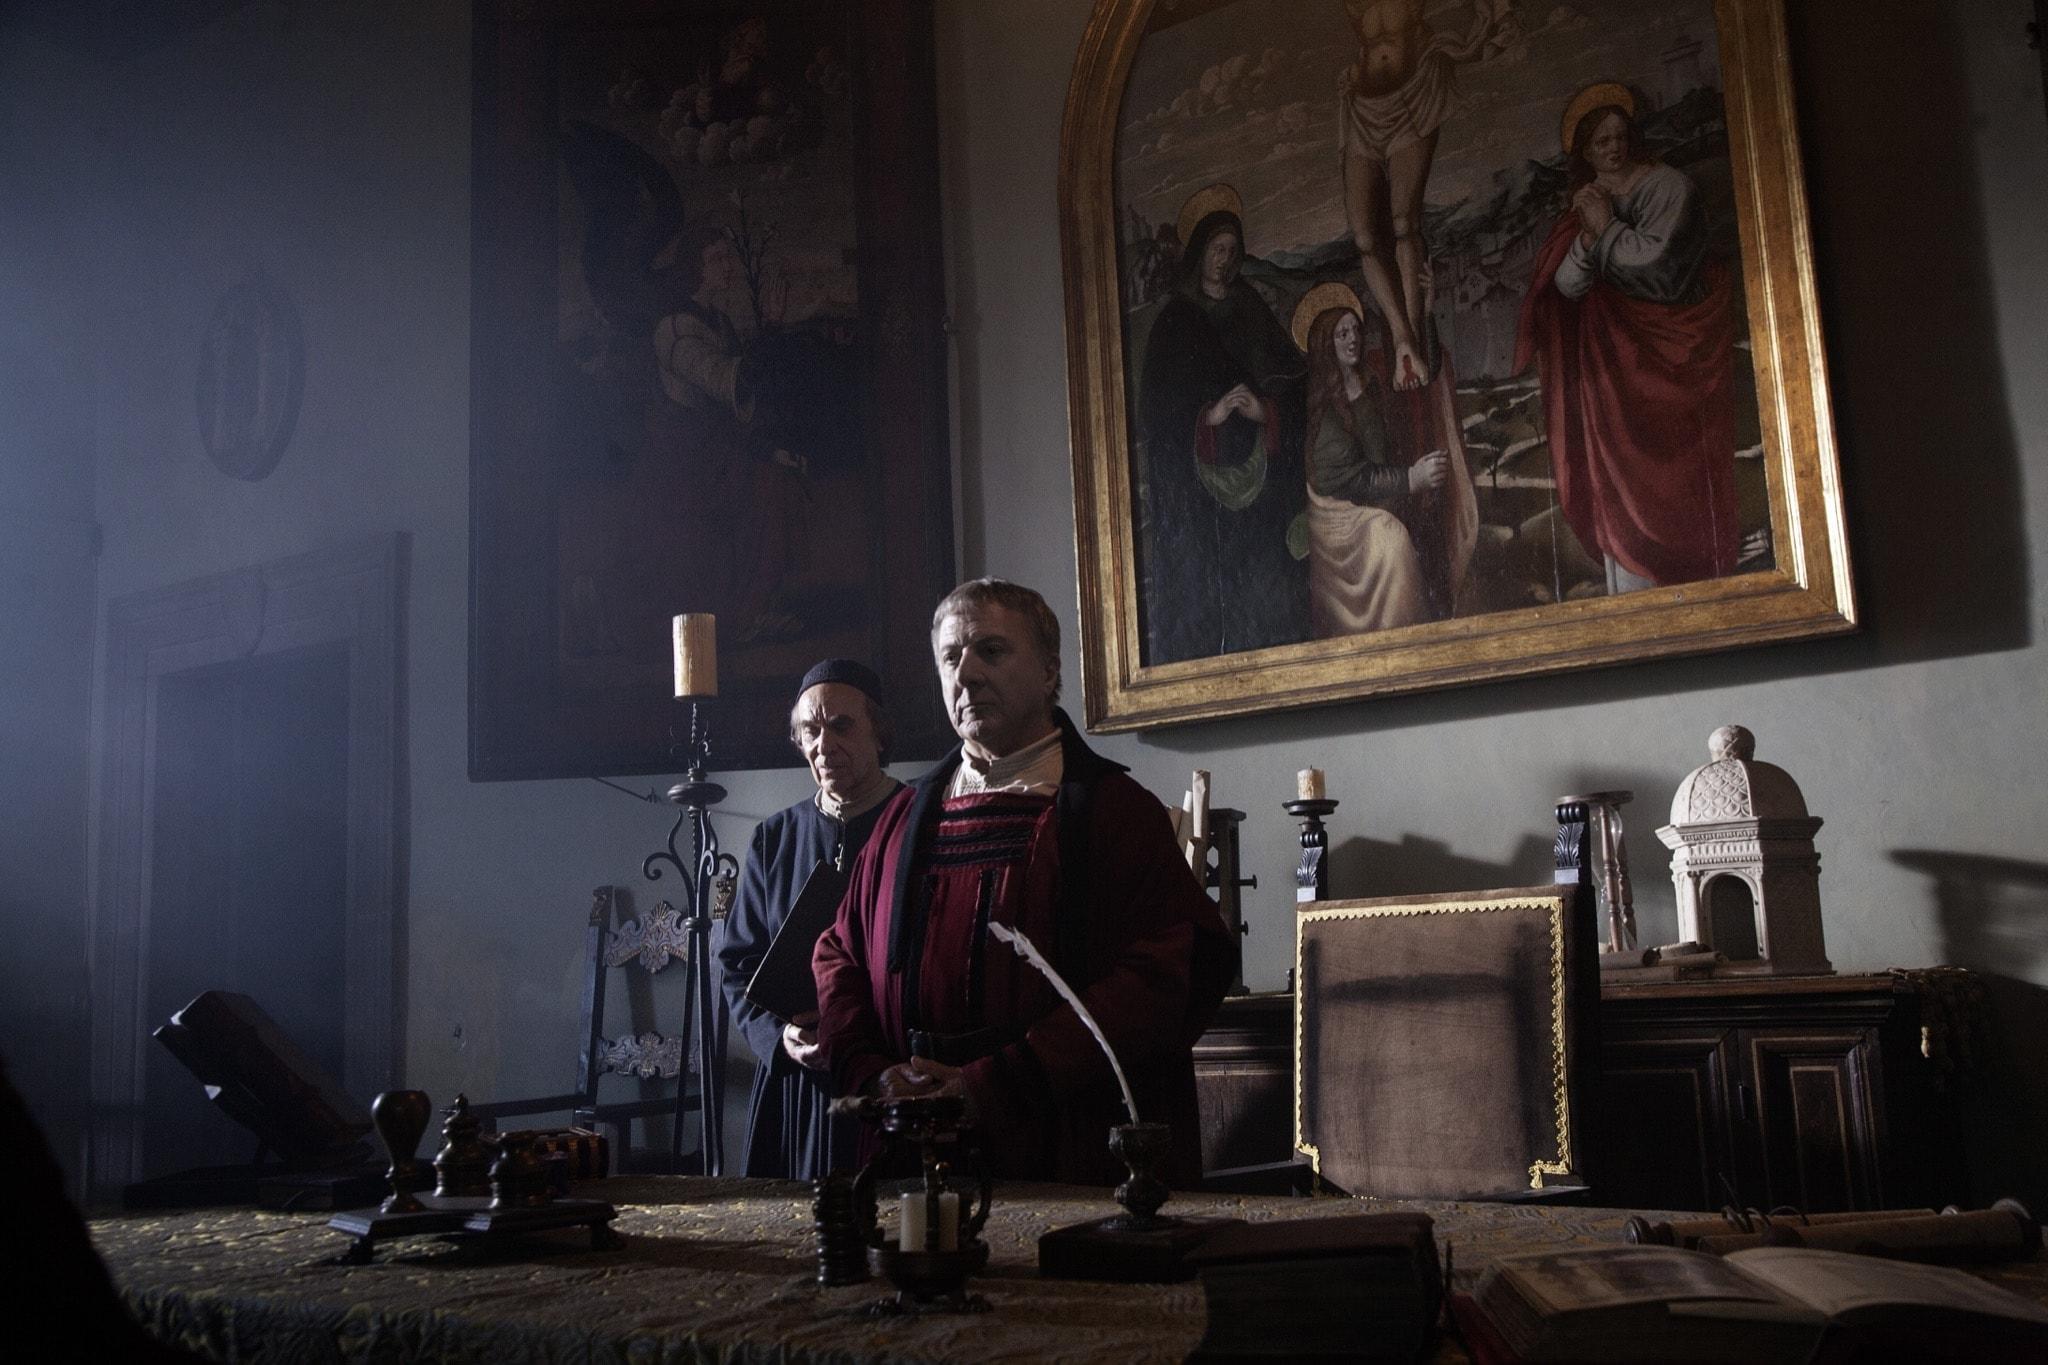 Medici: Masters of Florence season 1 image giovanni de' medicis